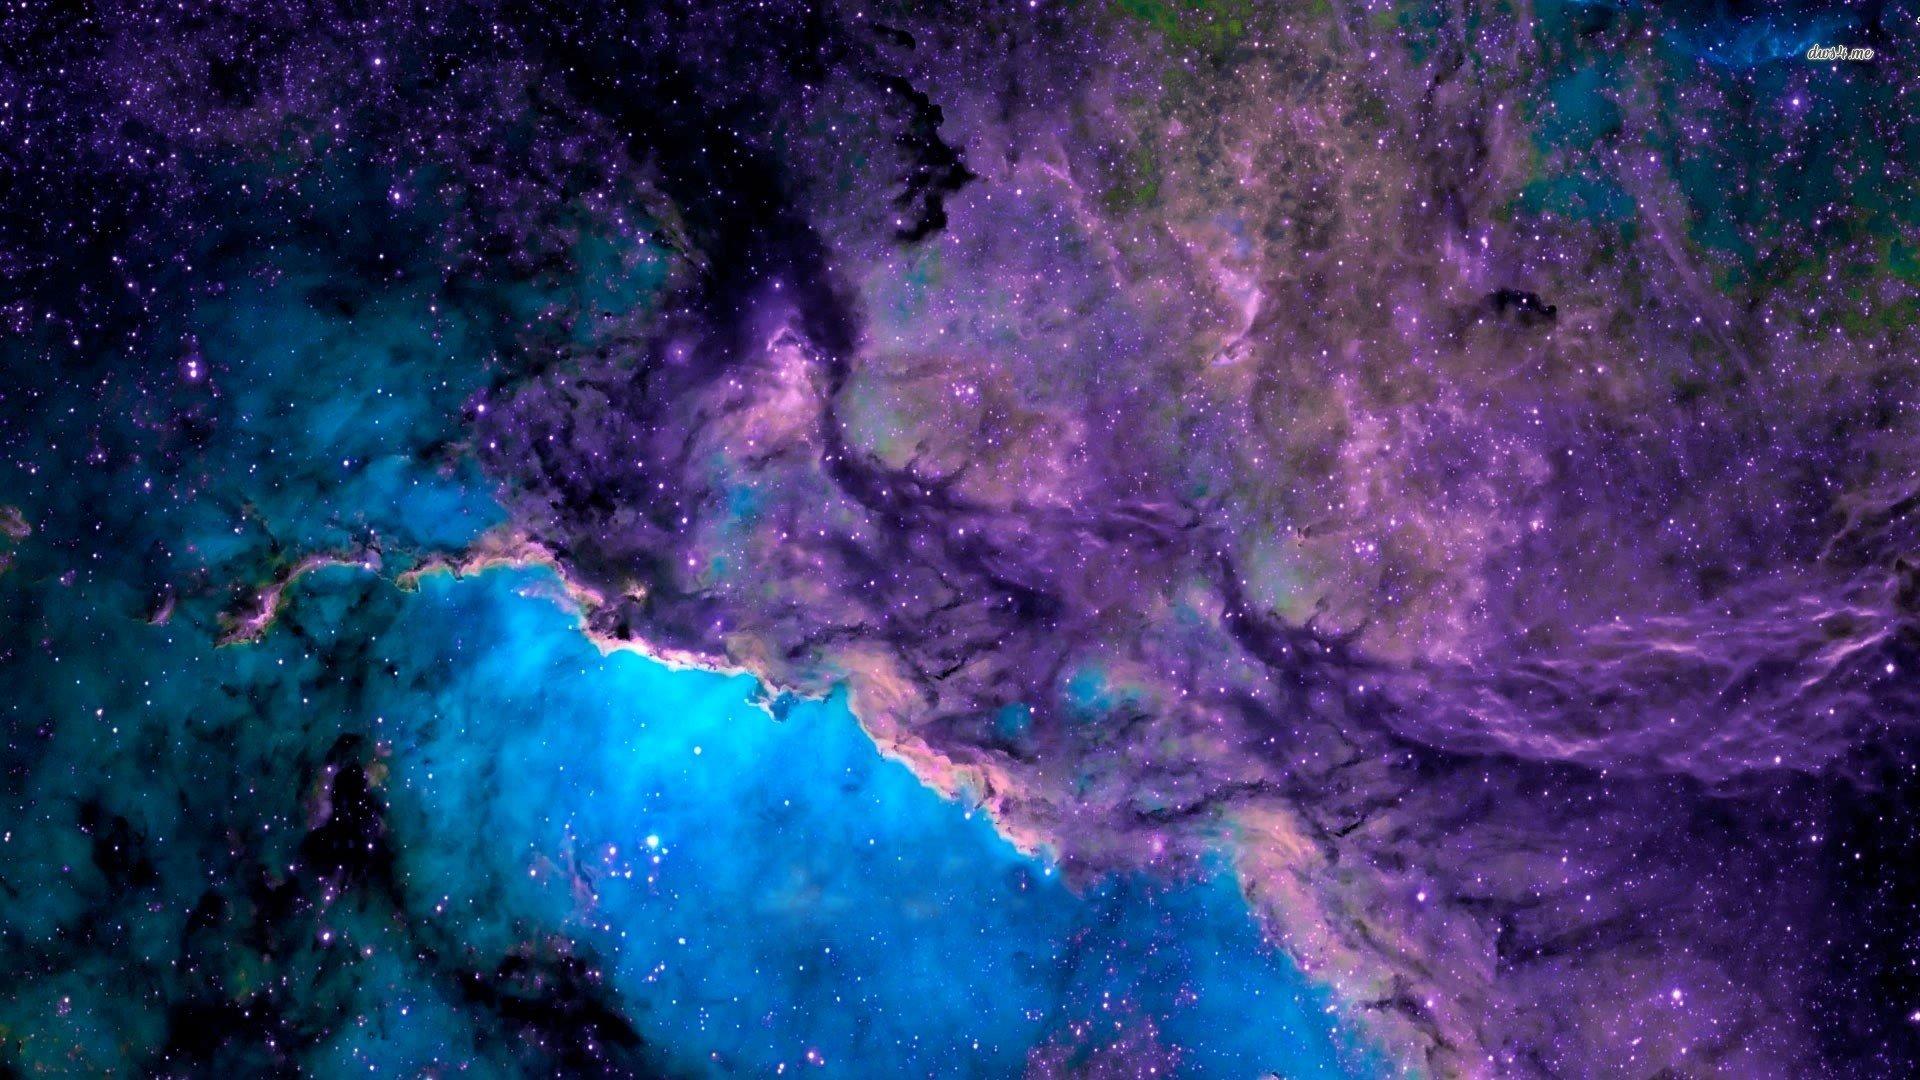 Blue Nebula wallpaper   1920x1080   416328   WallpaperUP